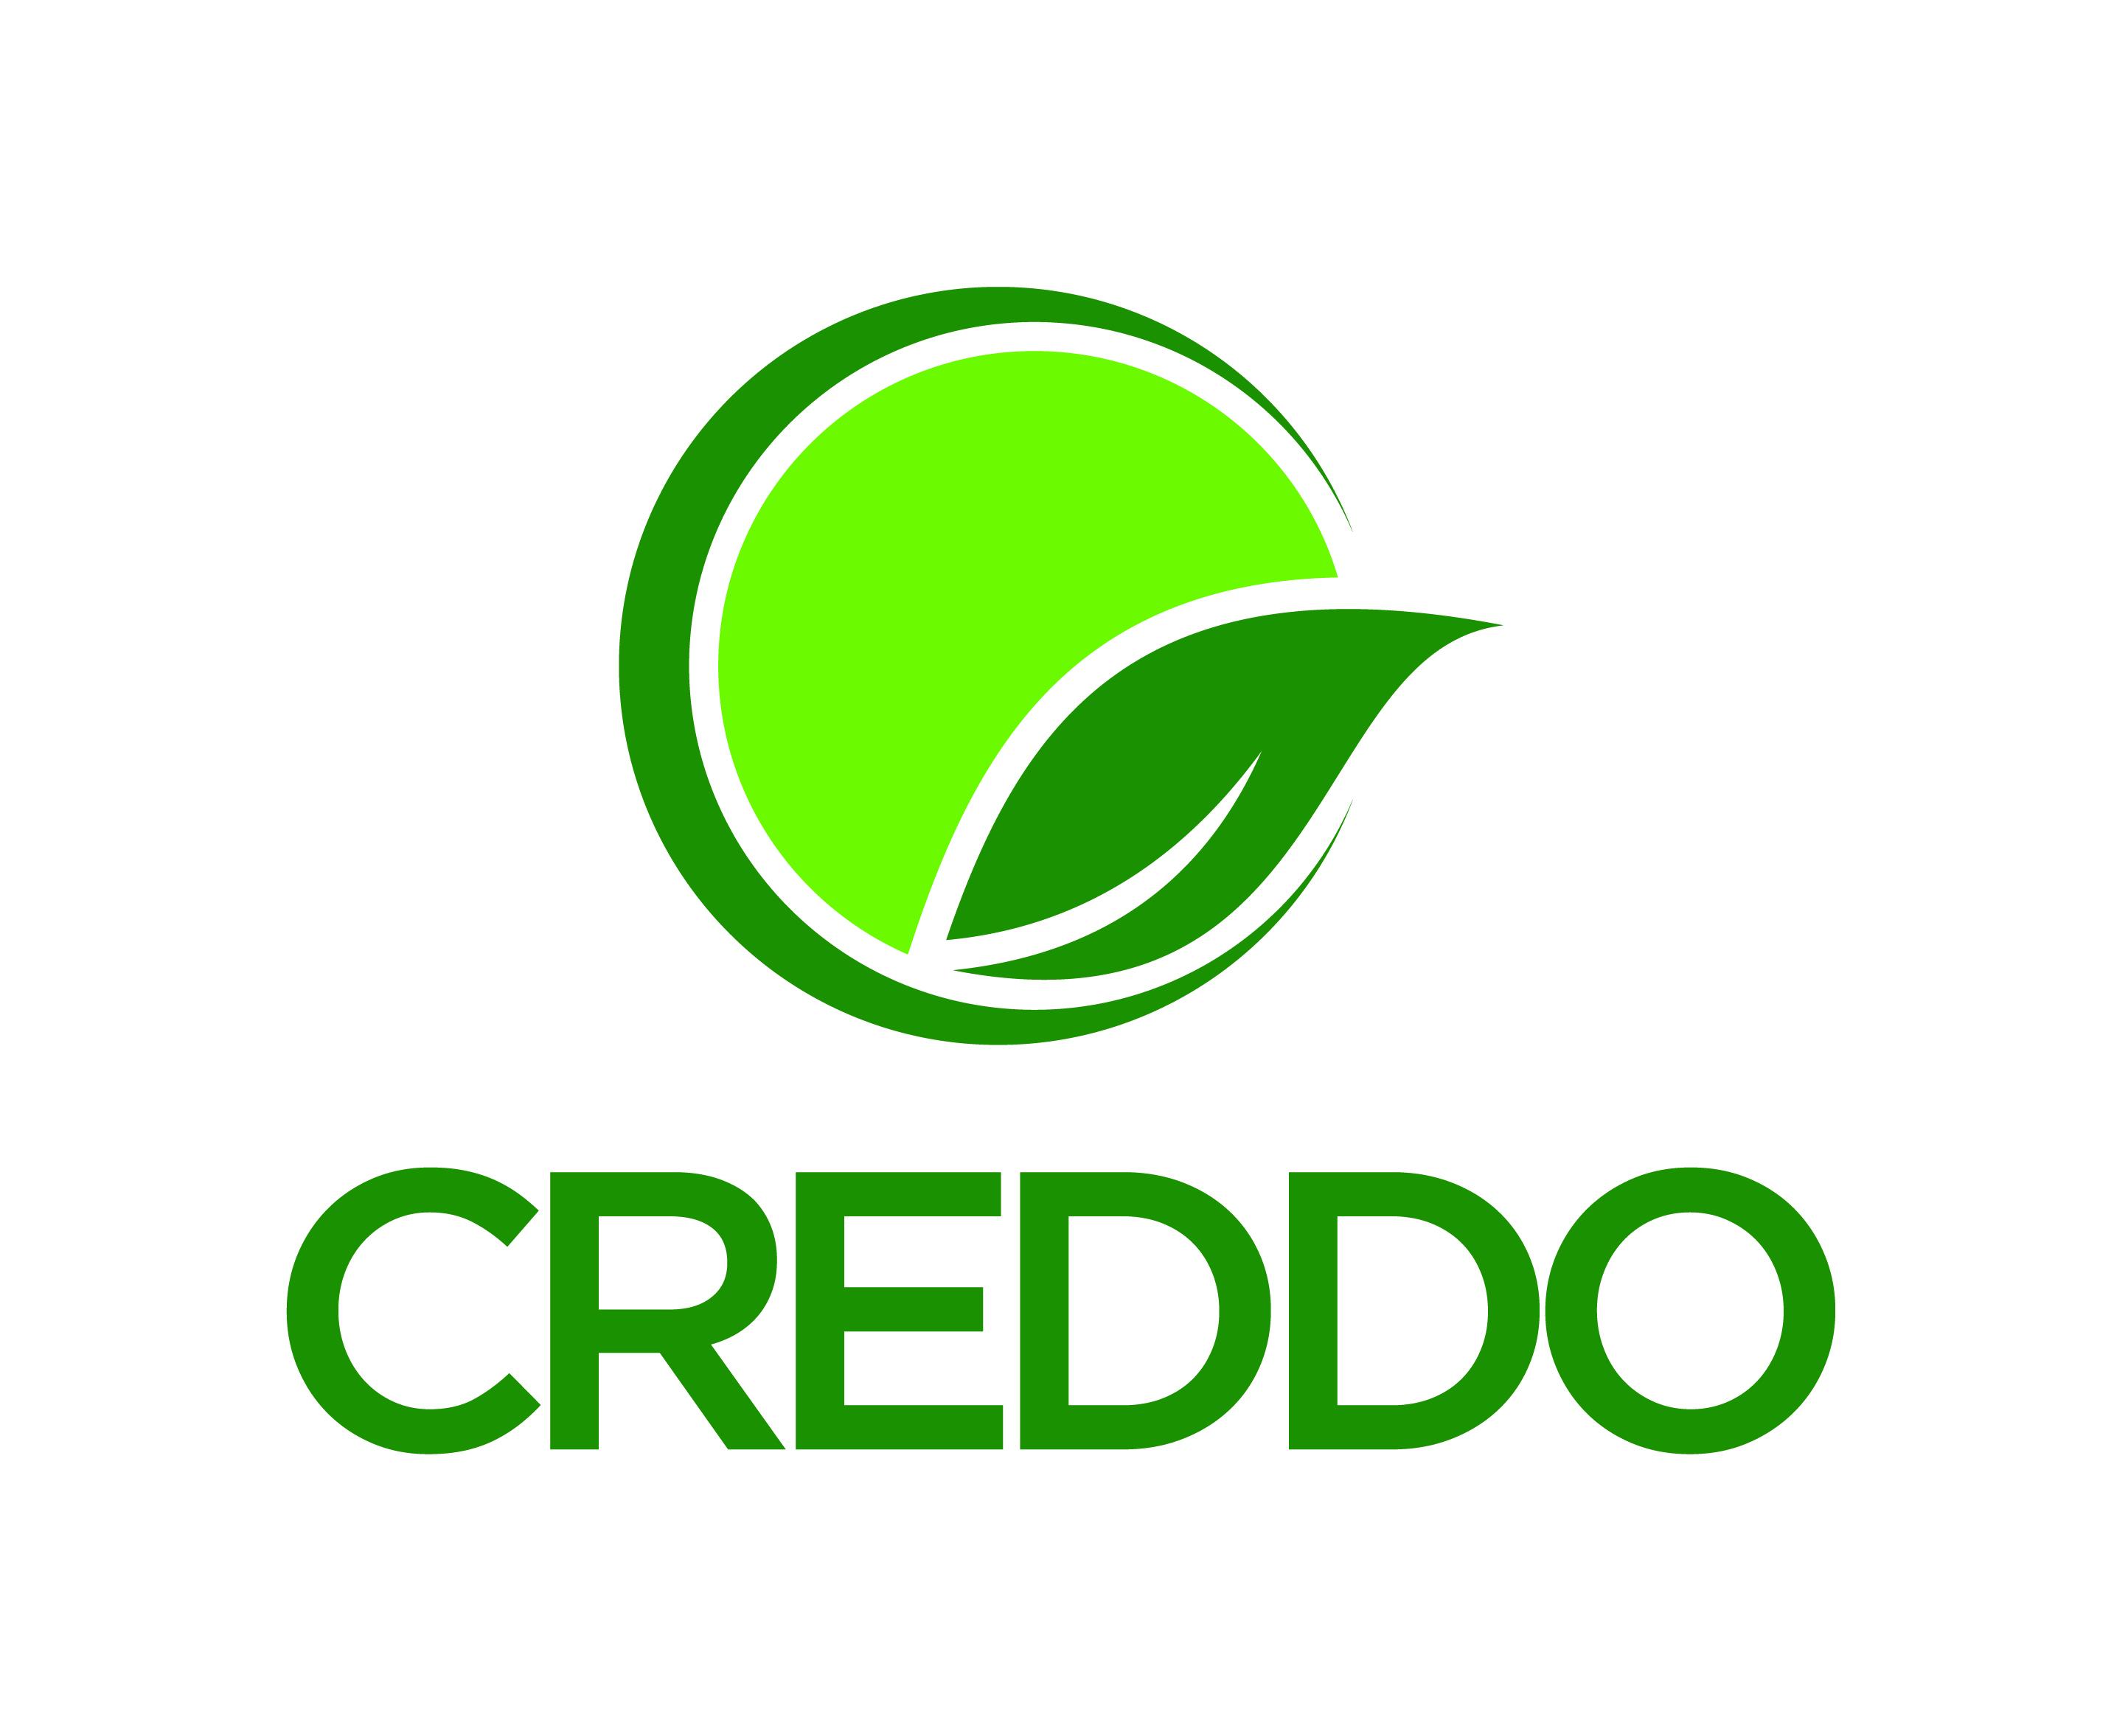 CREDDO